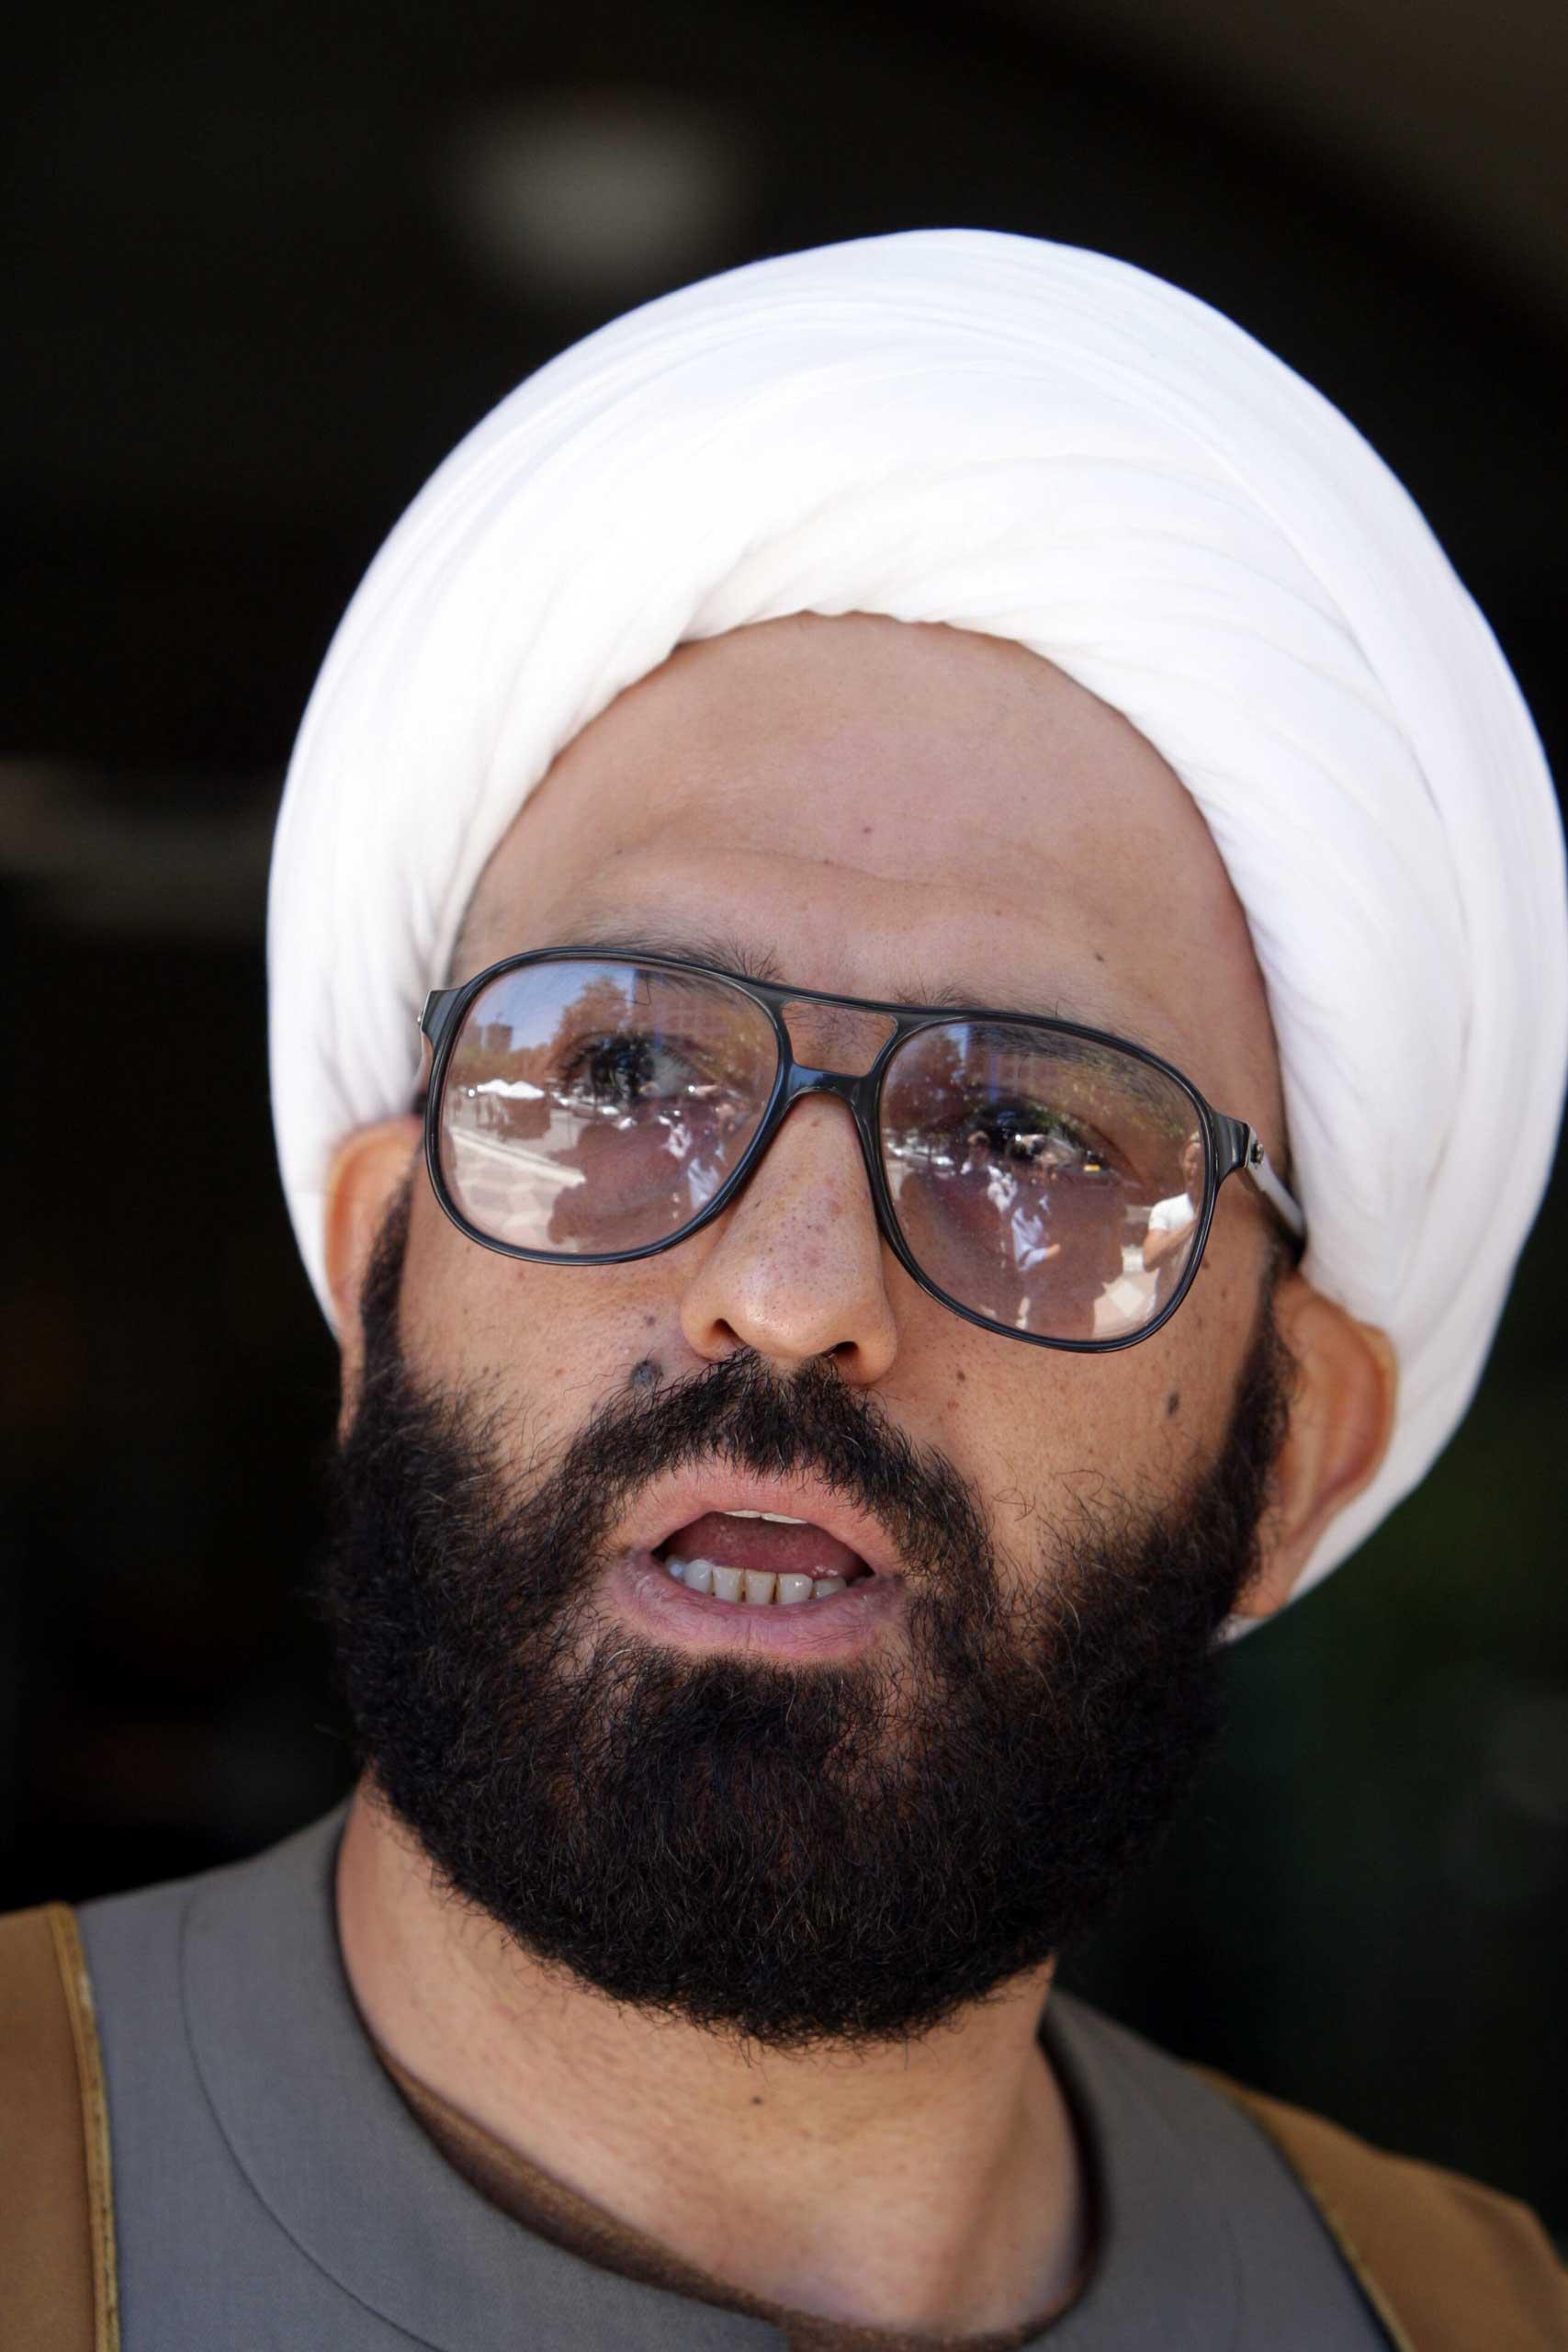 The self-declared sheikh named Man Haron Monis.